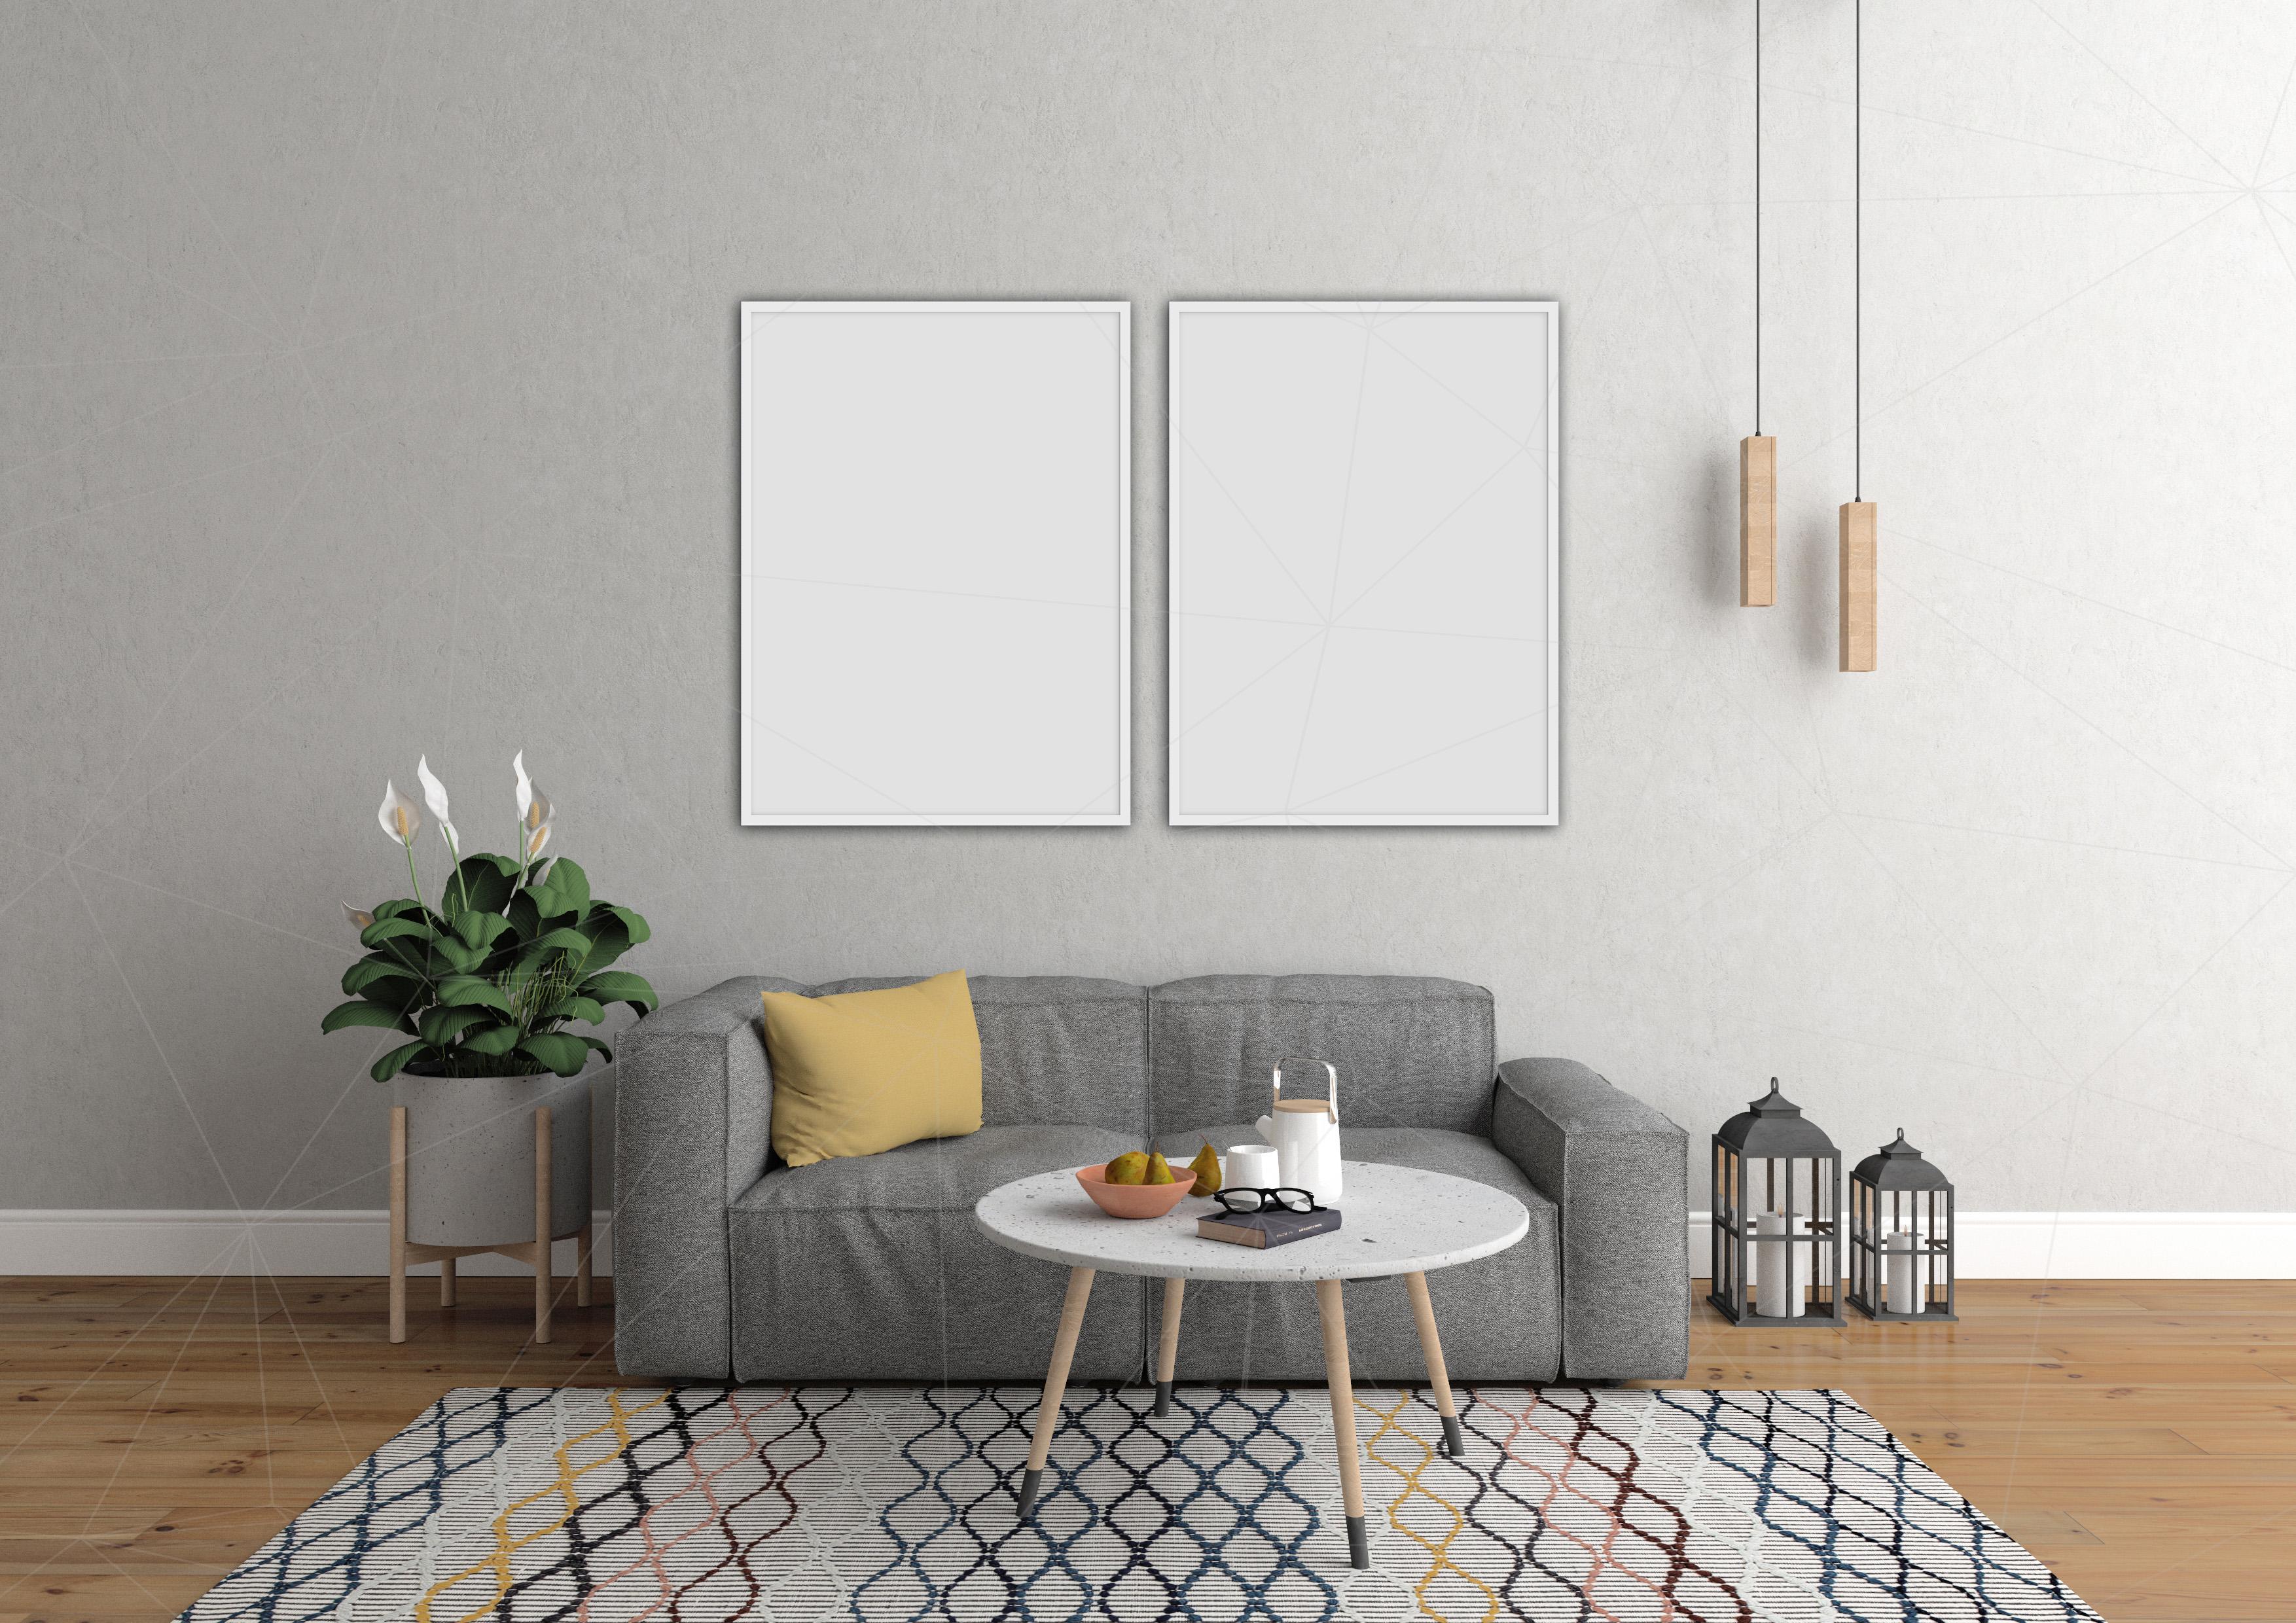 Interior mockup bundle - blank wall mock up example image 7